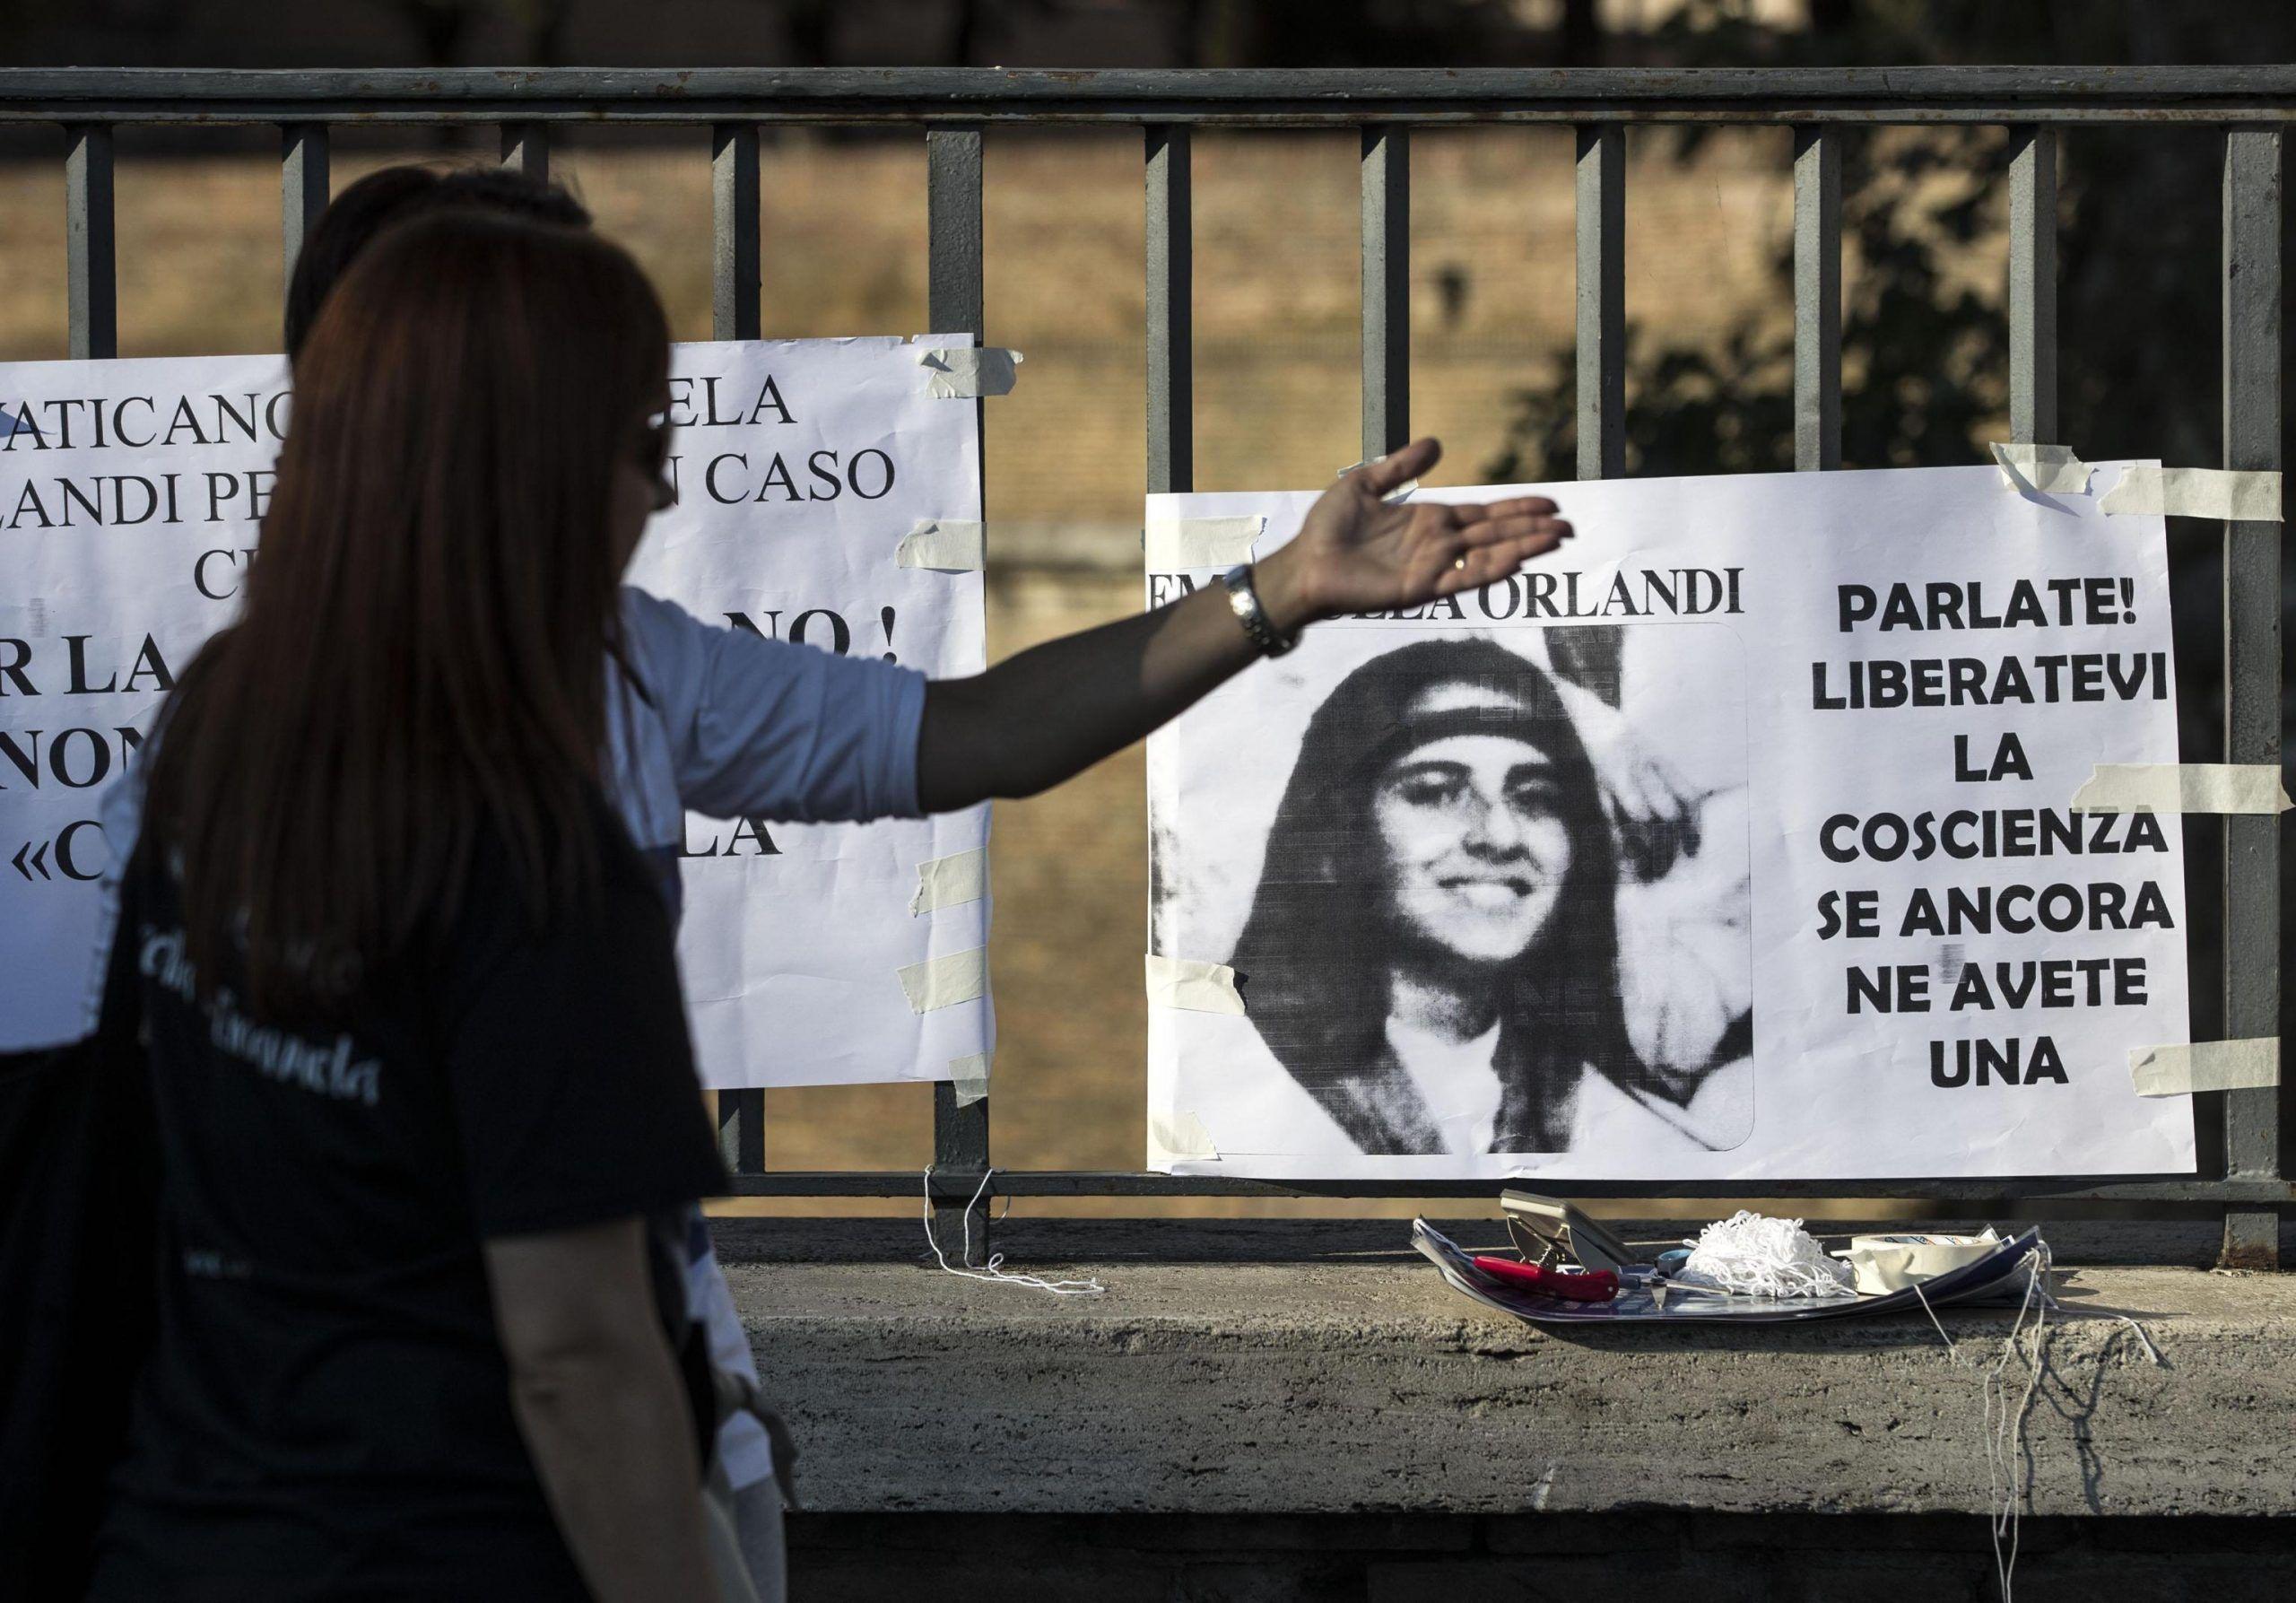 Orlandi: Pietro, Vaticano ha dossier su Emanuela, ce lo dia